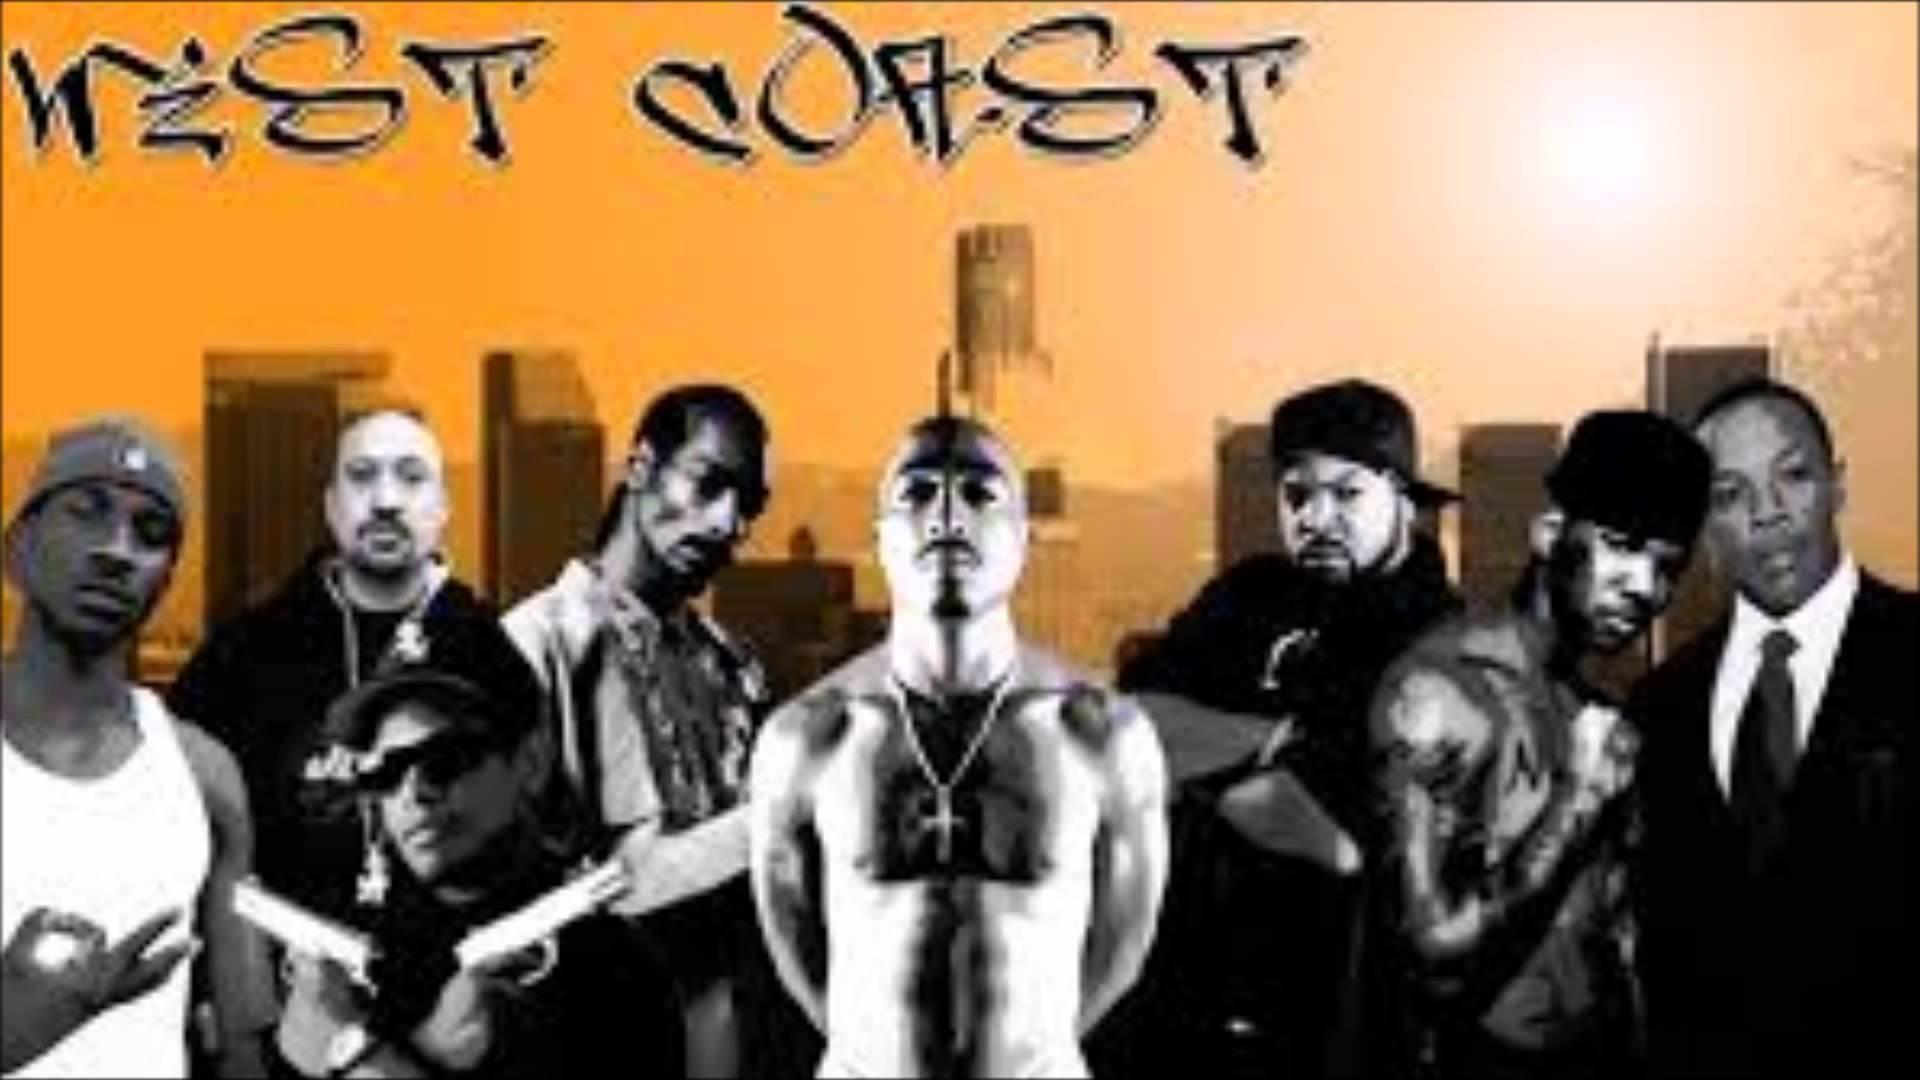 East Coast Hip Hop Wallpapers Top Free East Coast Hip Hop Backgrounds Wallpaperaccess